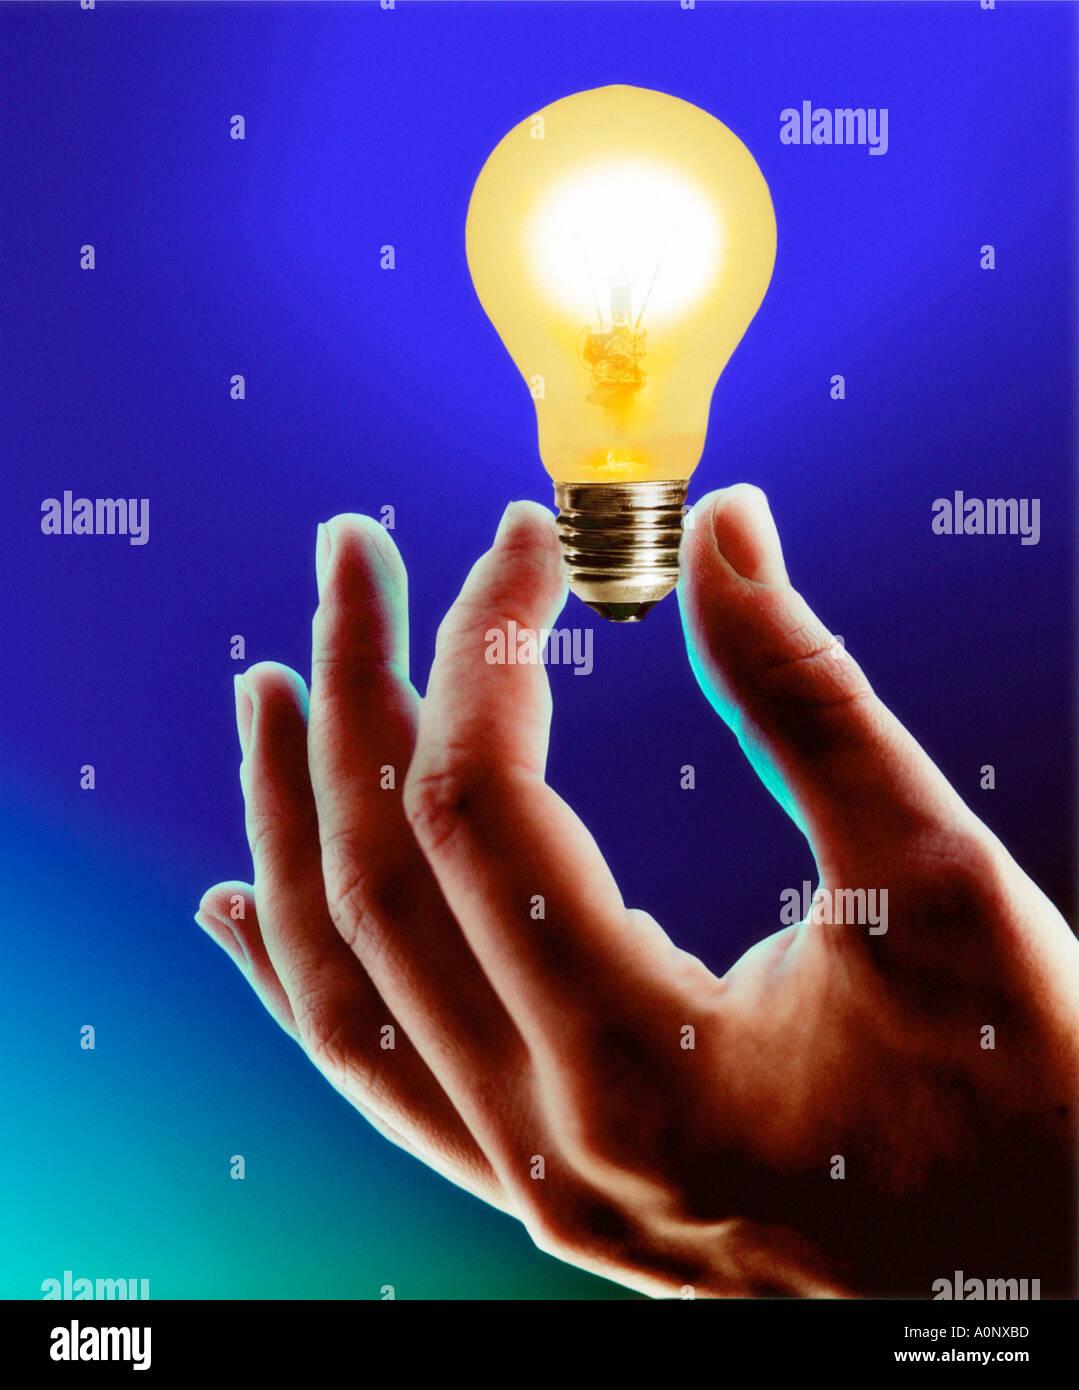 Hand Holding Light Bulb Stock Photo